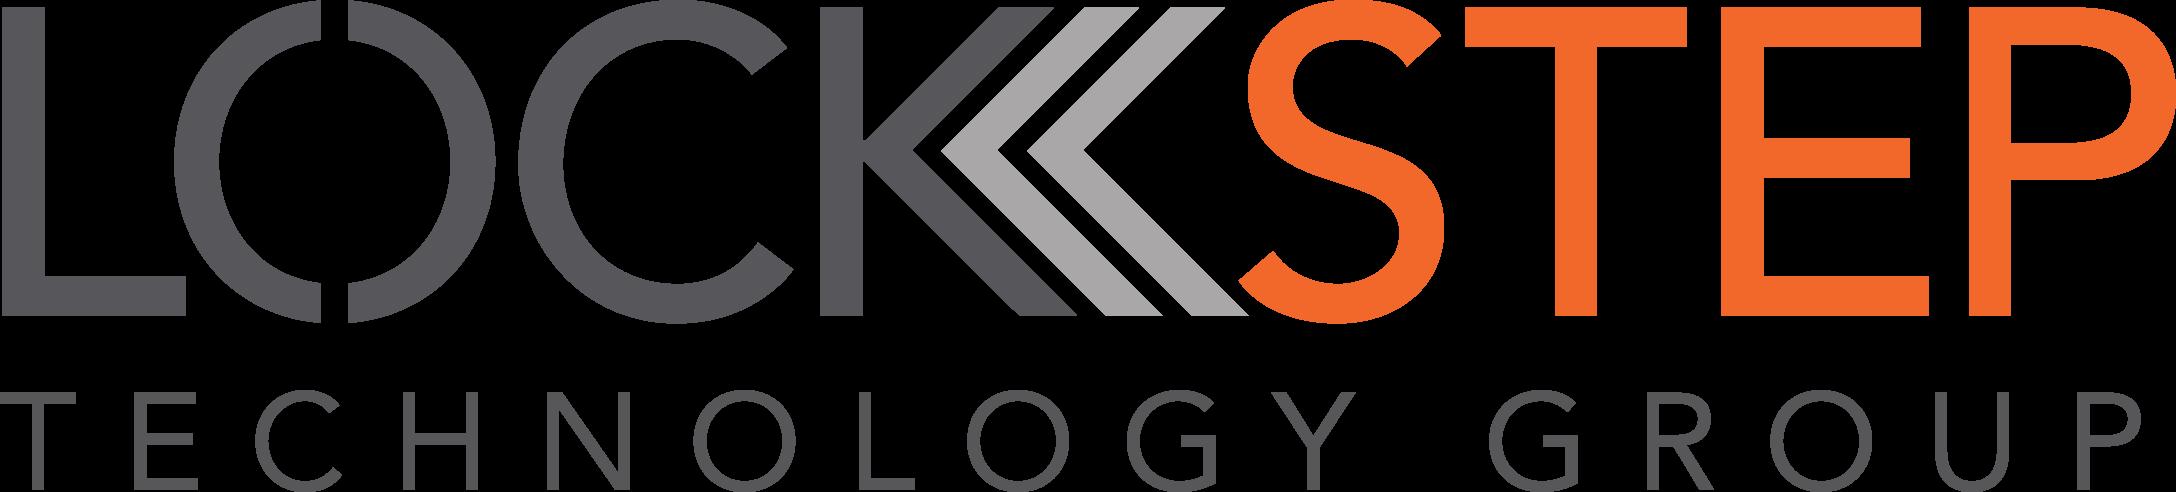 Lockstep Logo Refreshed 2017